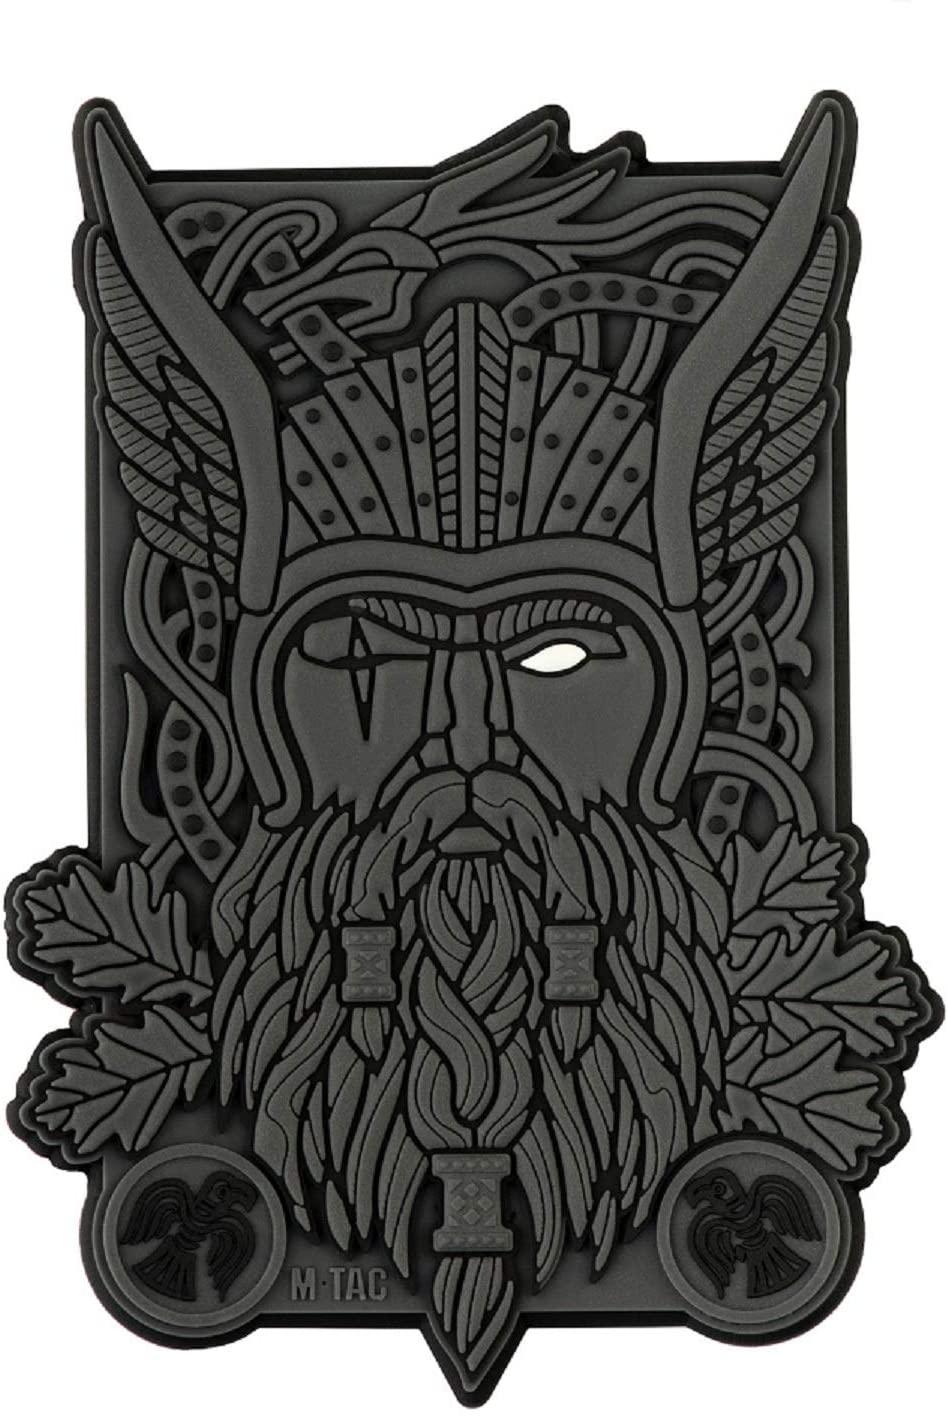 M-Tac Tactical Morale Patch Odin Viking War God 3D PVC